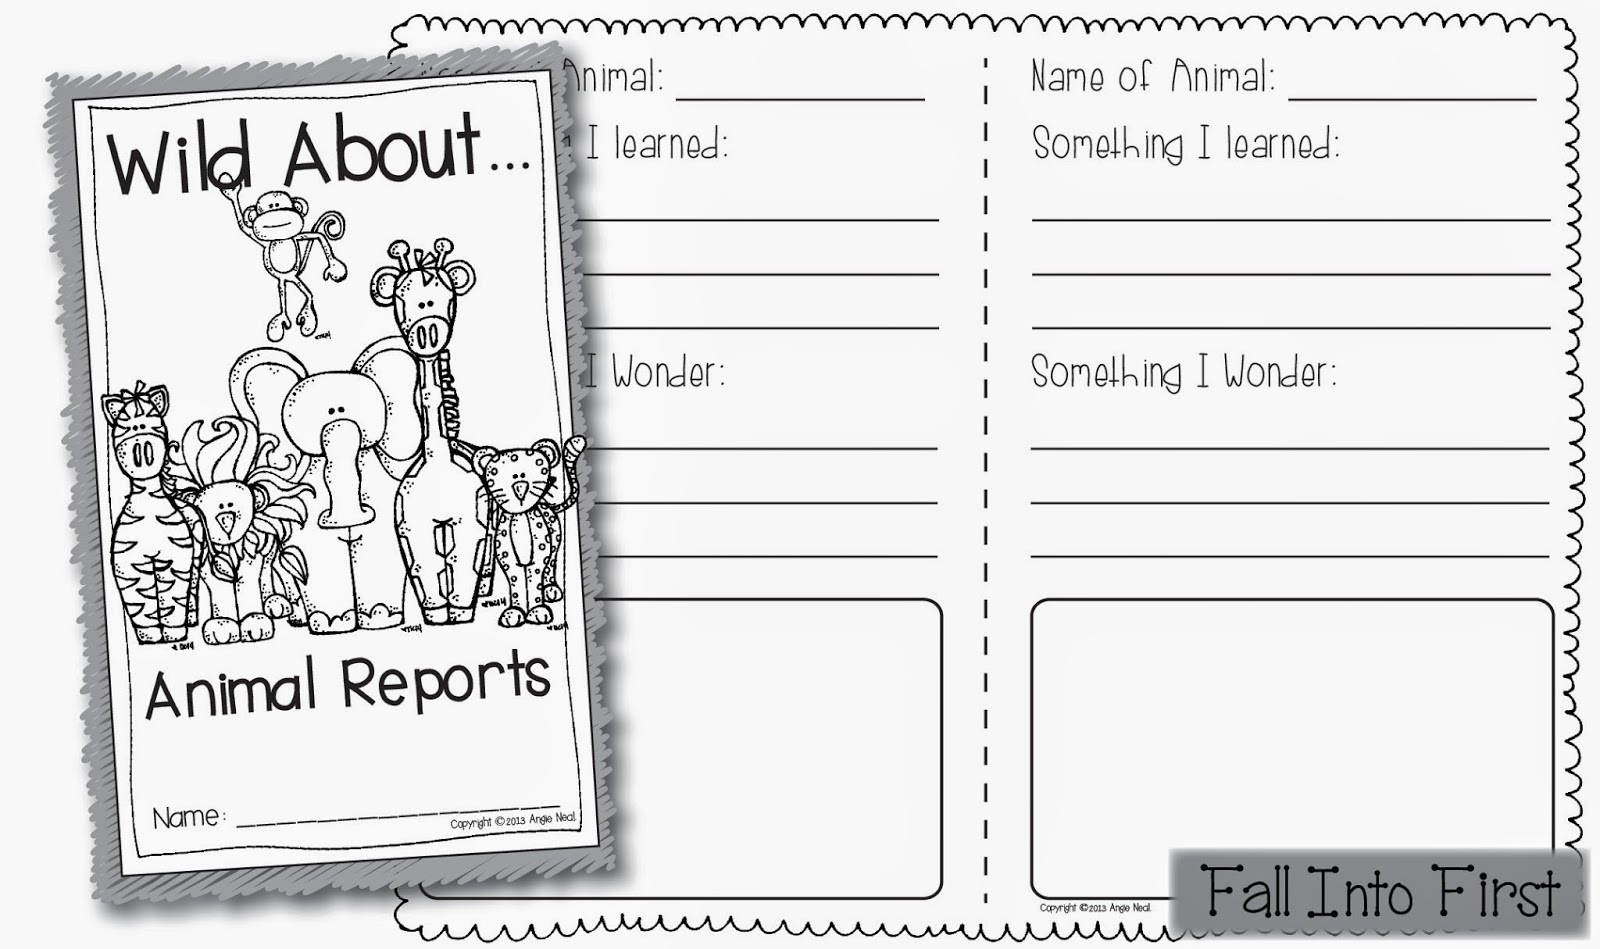 Writing an animal report